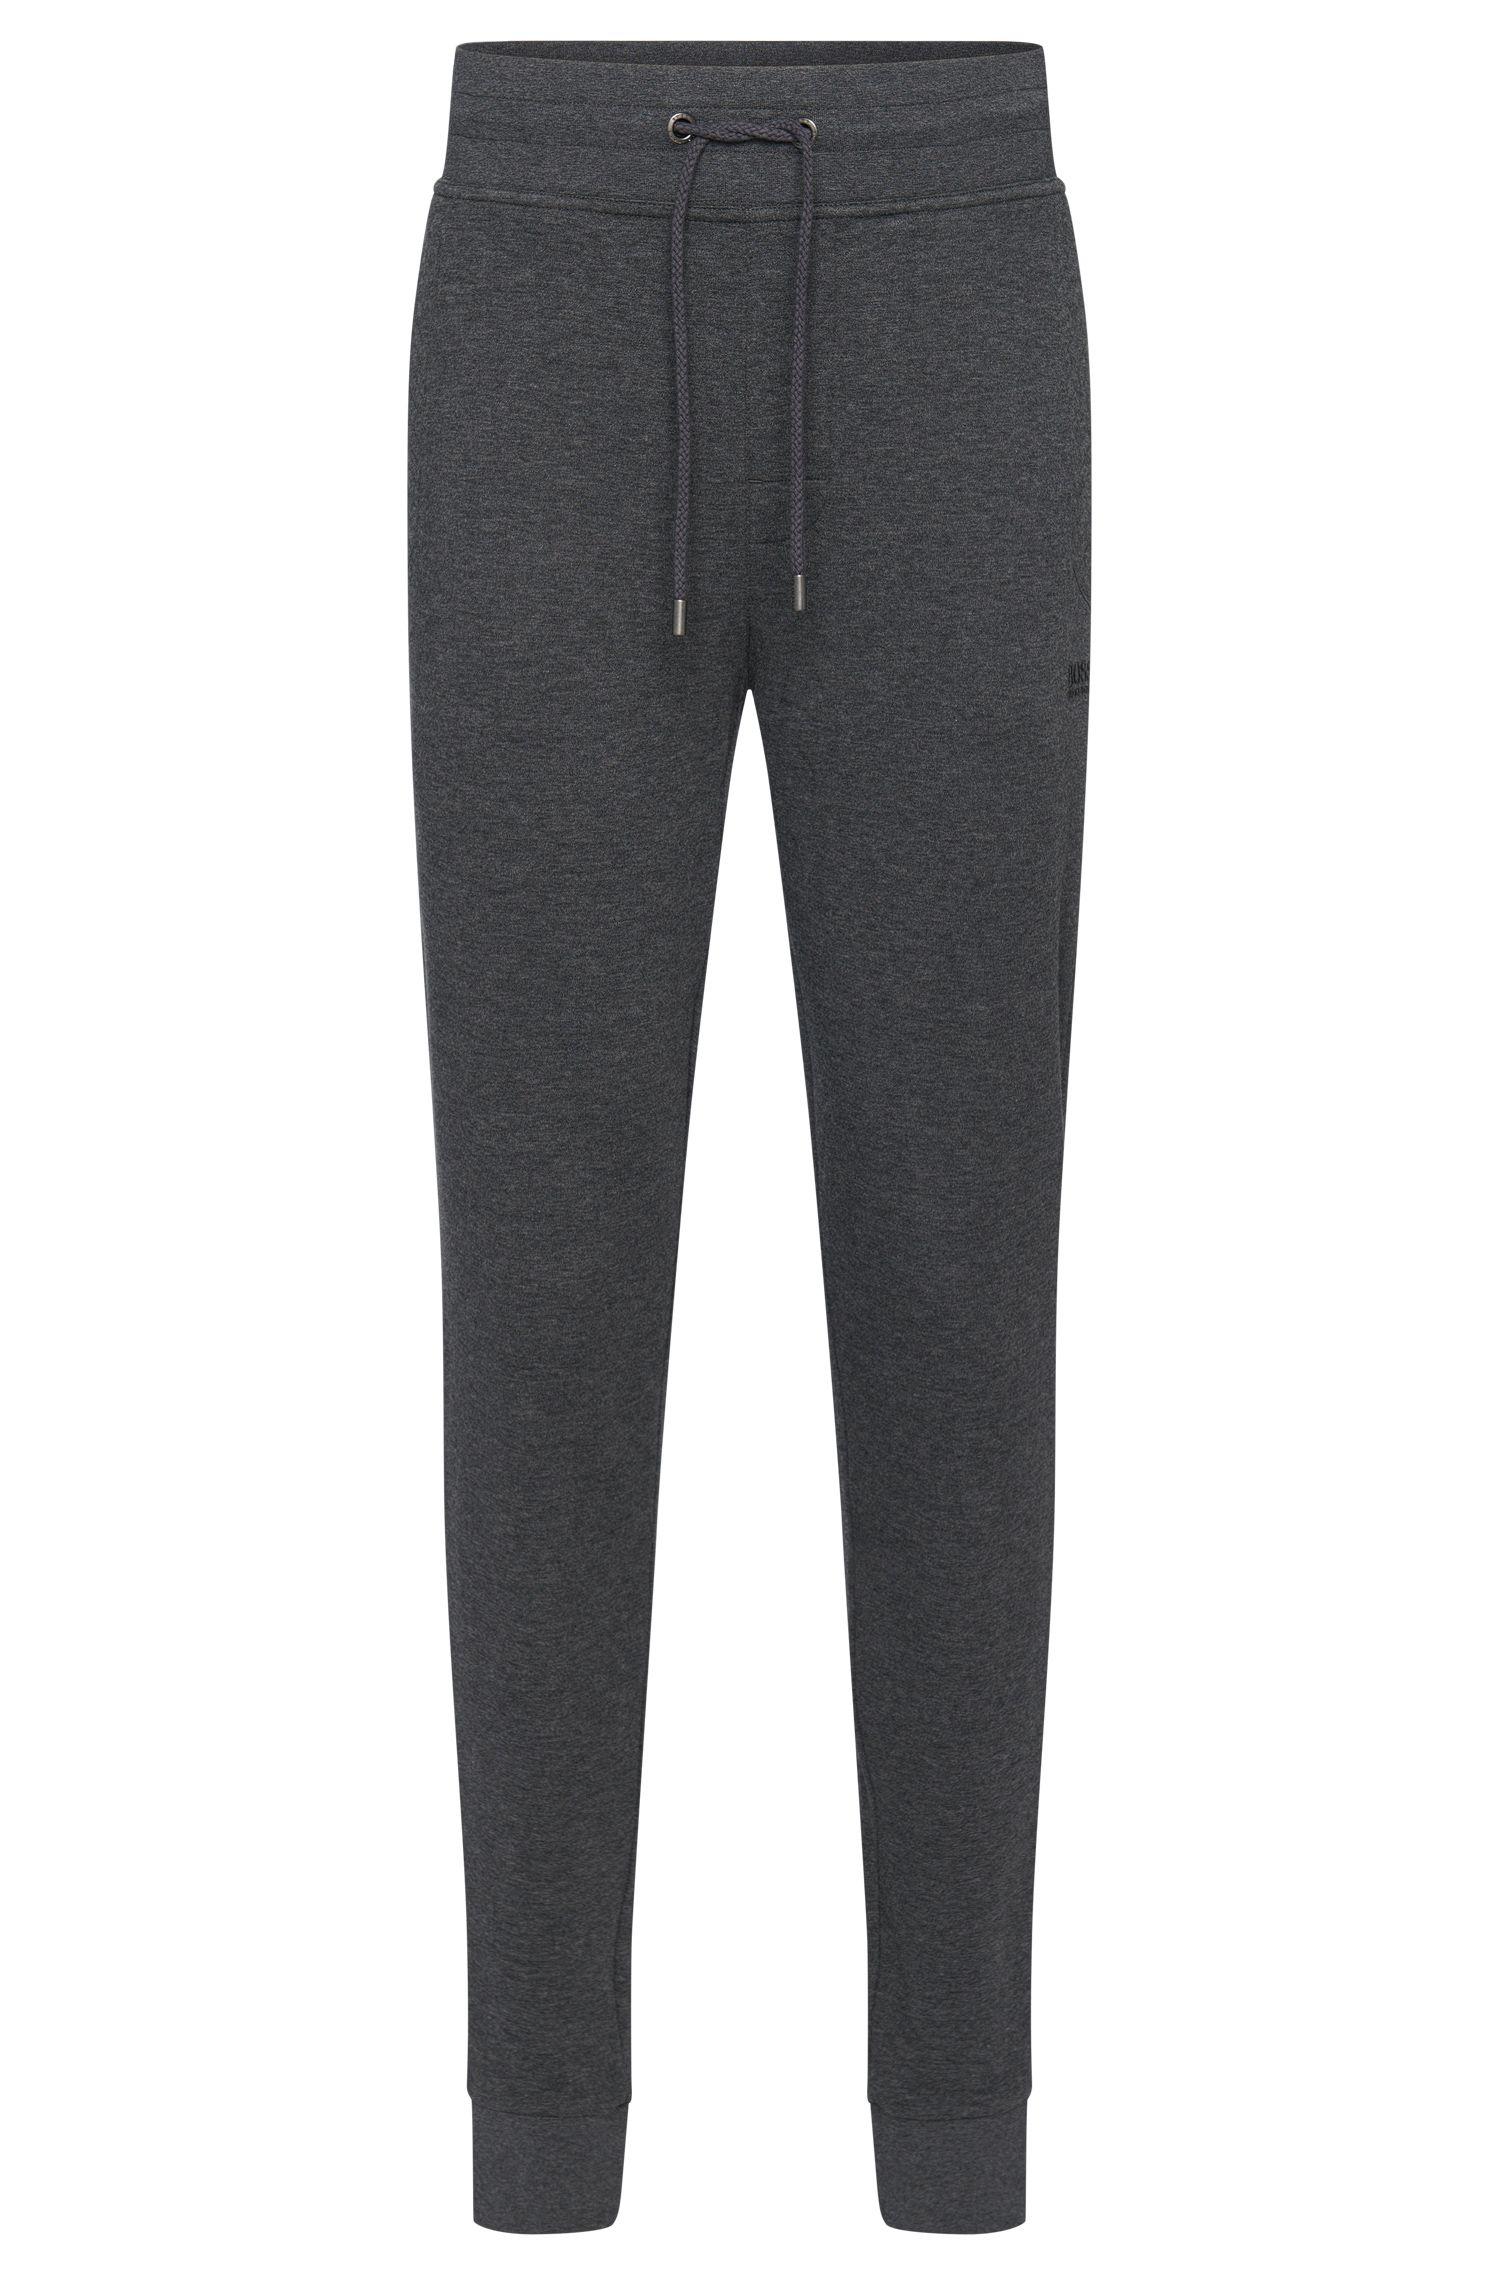 Cotton Drawstring Sweat Pant | Long Pant Cuffs, Grey